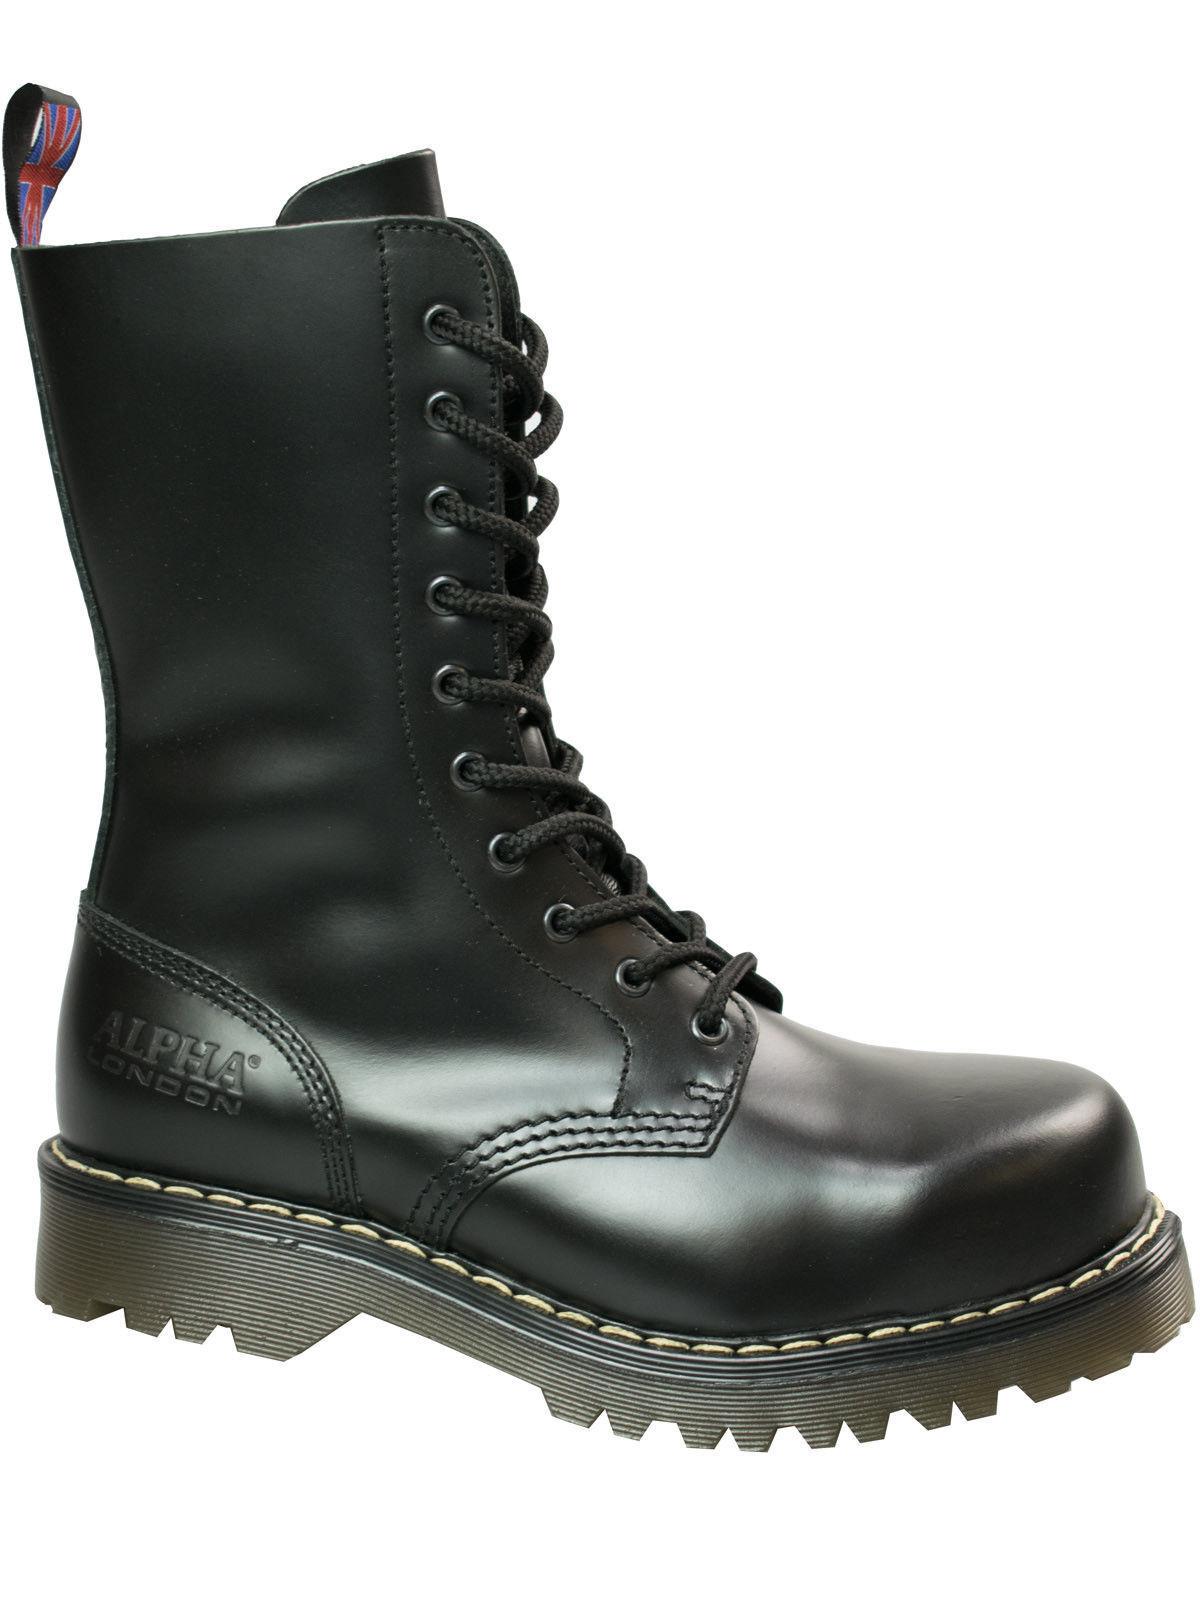 Alpha London 10-loch Boot 4428 Mit Stahlkappe Beige Sohle   Beige Naht  5049